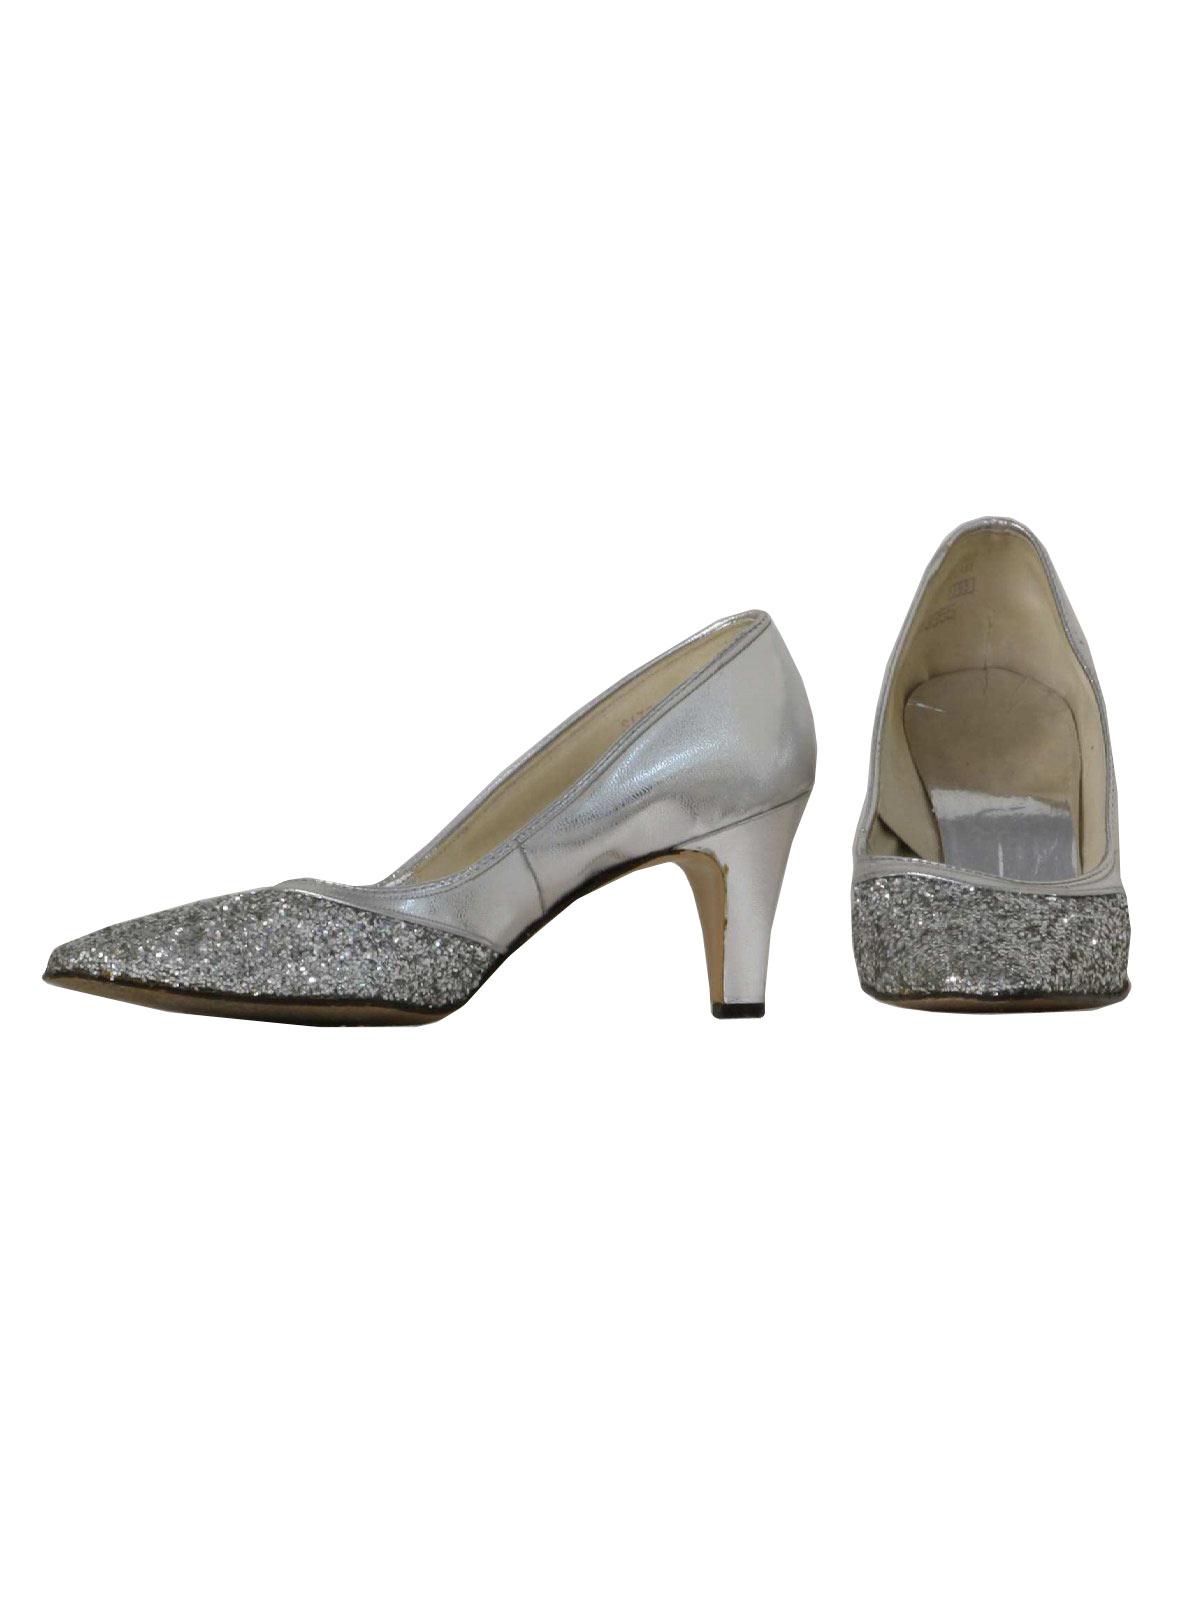 d8e5aa56182 1970's Retro Shoes: 70s -Sears Fashions- Womens silver vinyl pumps ...